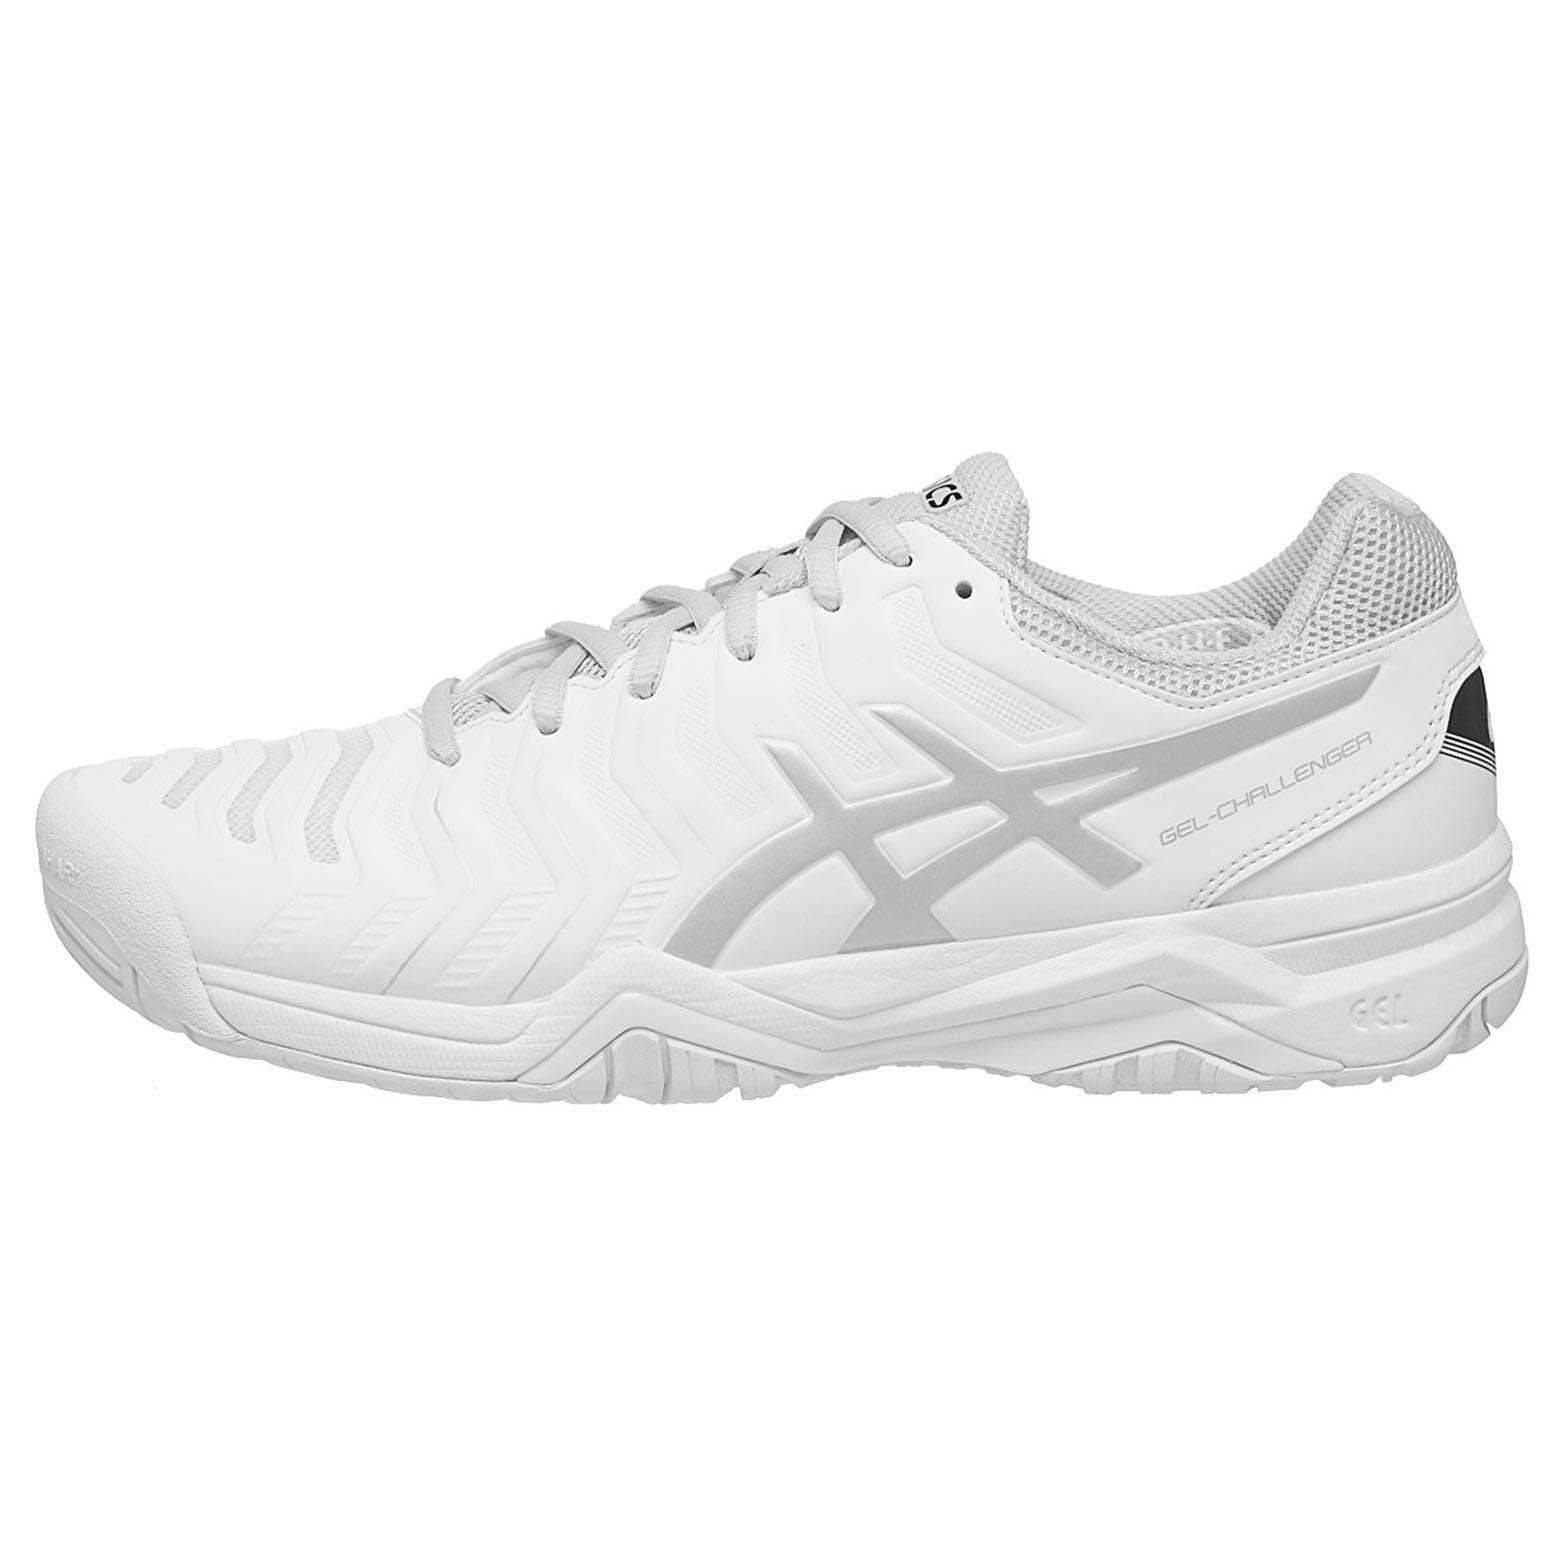 Asics Men S Gel Challenger  Tennis Shoe Weight